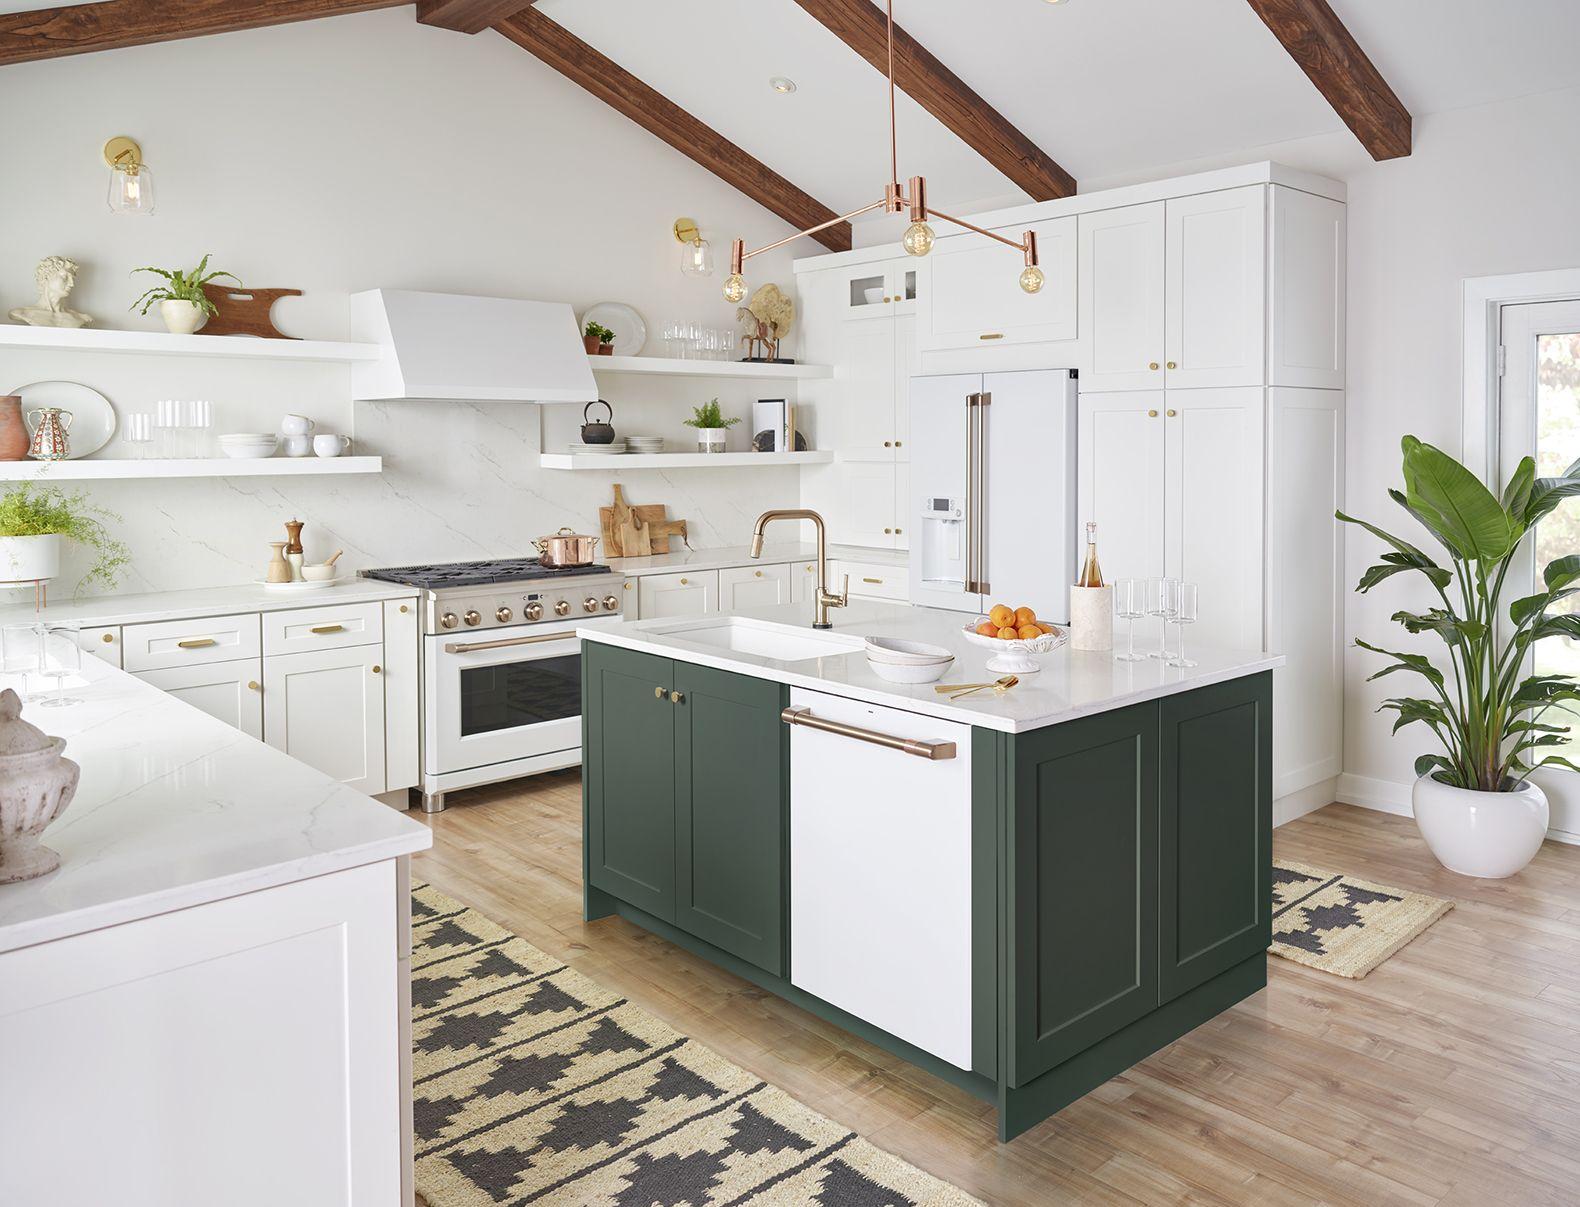 Dream Kitchen Inspiration + Win 4 Chic Appliances!   Kitchen ...